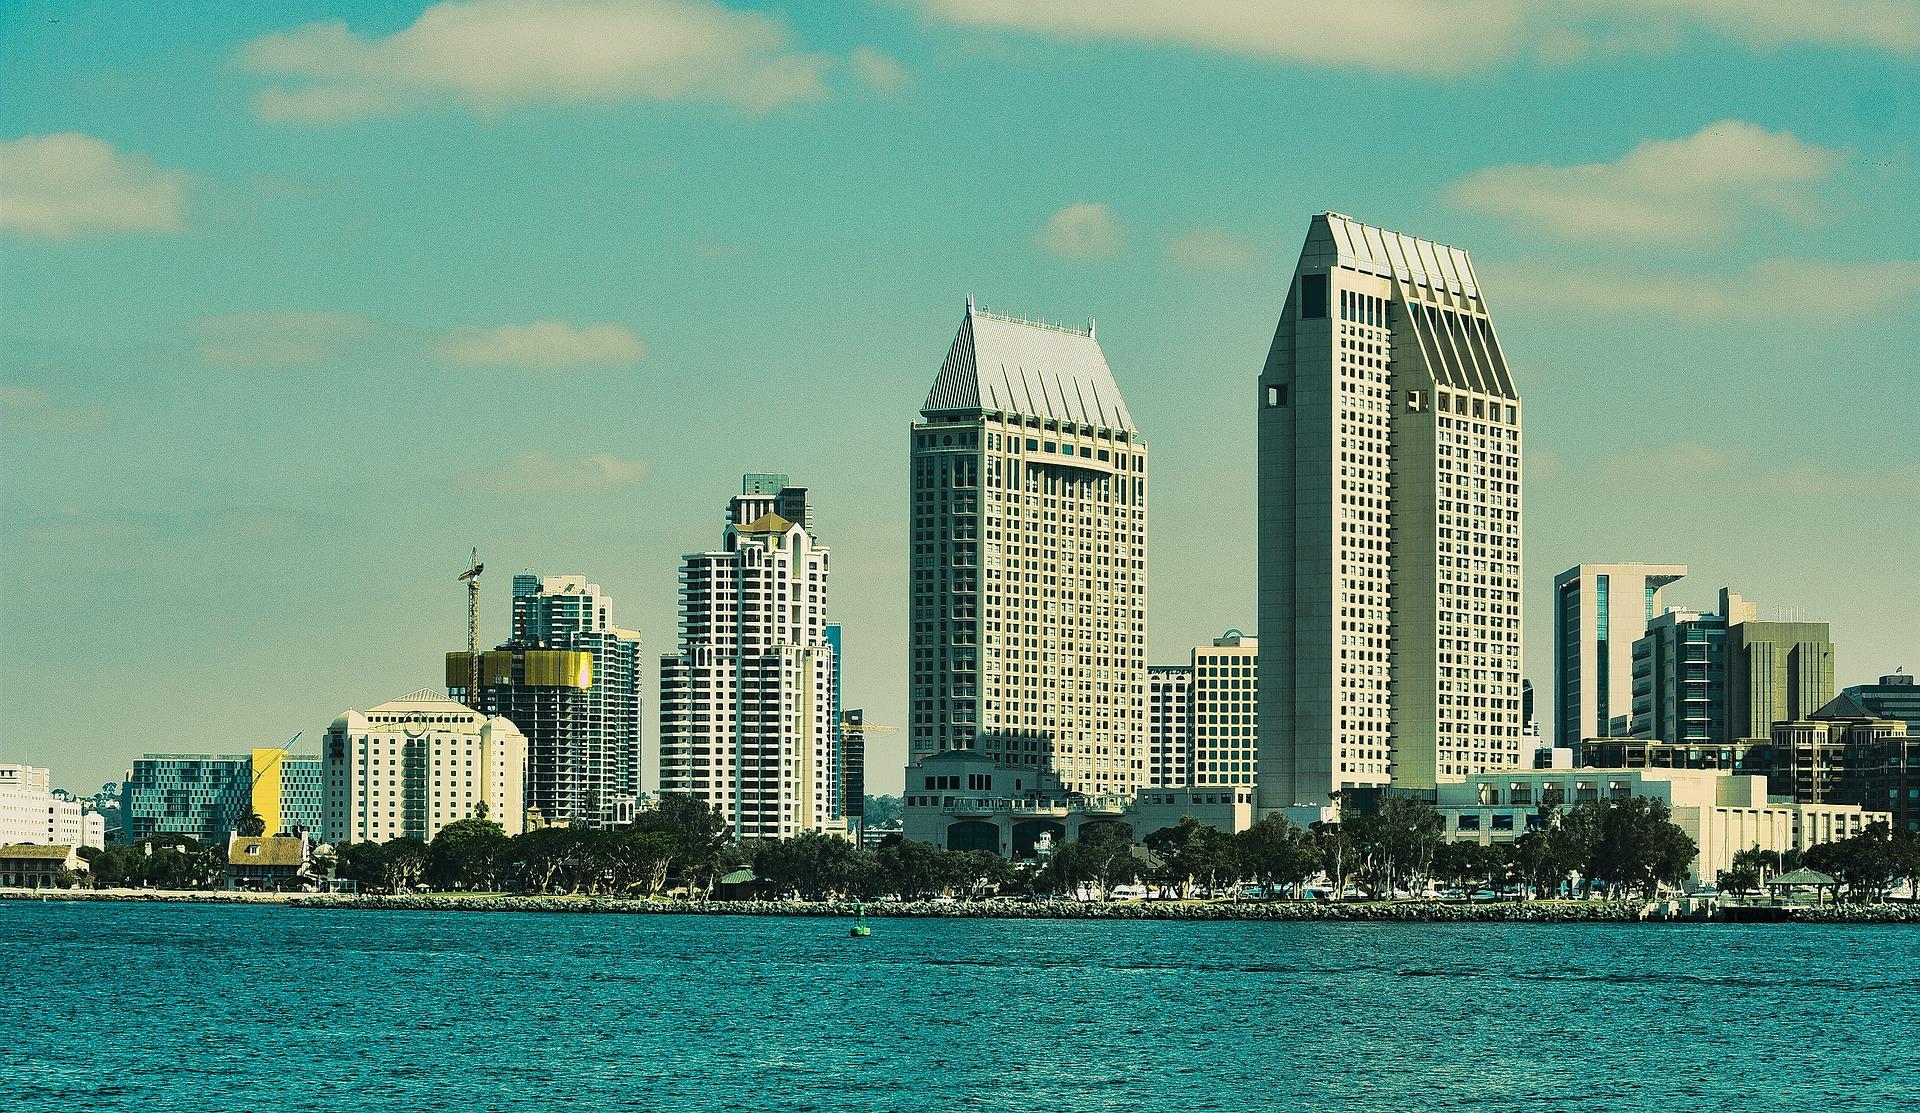 San Diego | DigiNo | 10 Best Locations For Digital Nomads